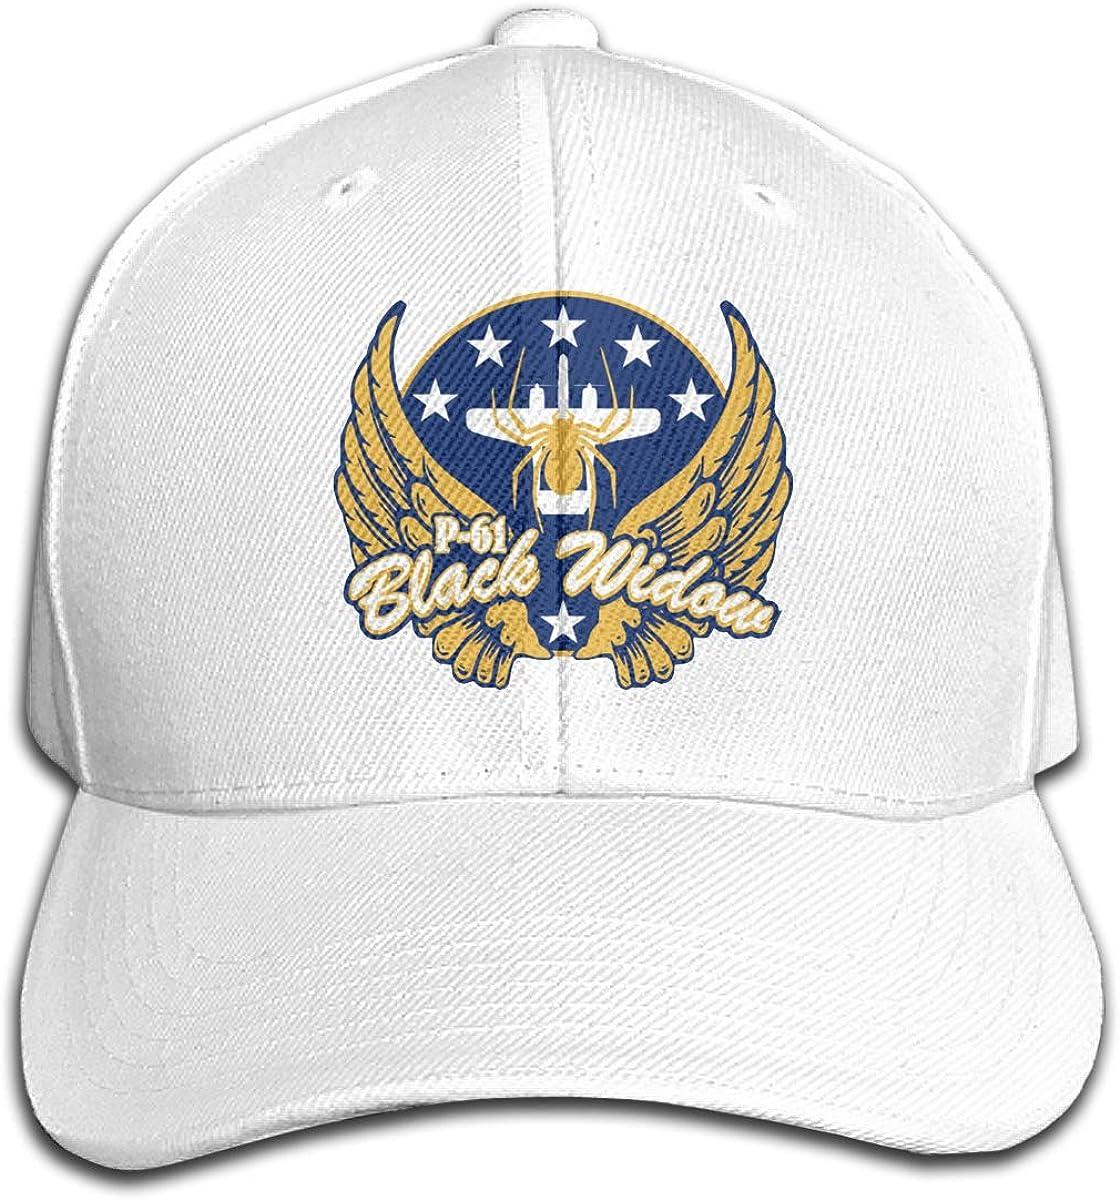 Zdsg WW2 Air Force USAAF Dad Hat Unisex Cotton Hat Adjustable Baseball Cap